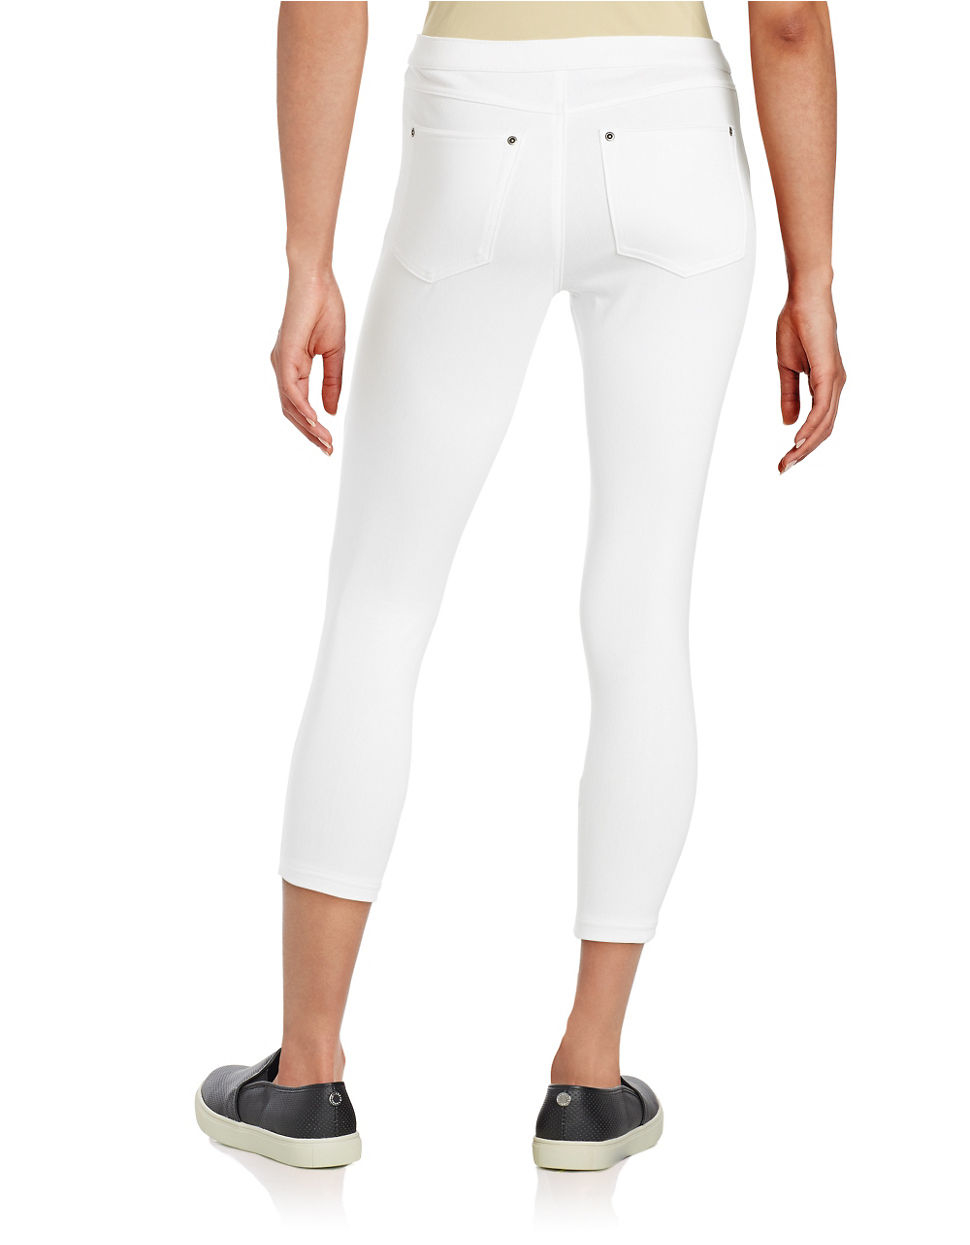 Hue Super Smooth Denim Capri Leggings in White | Lyst